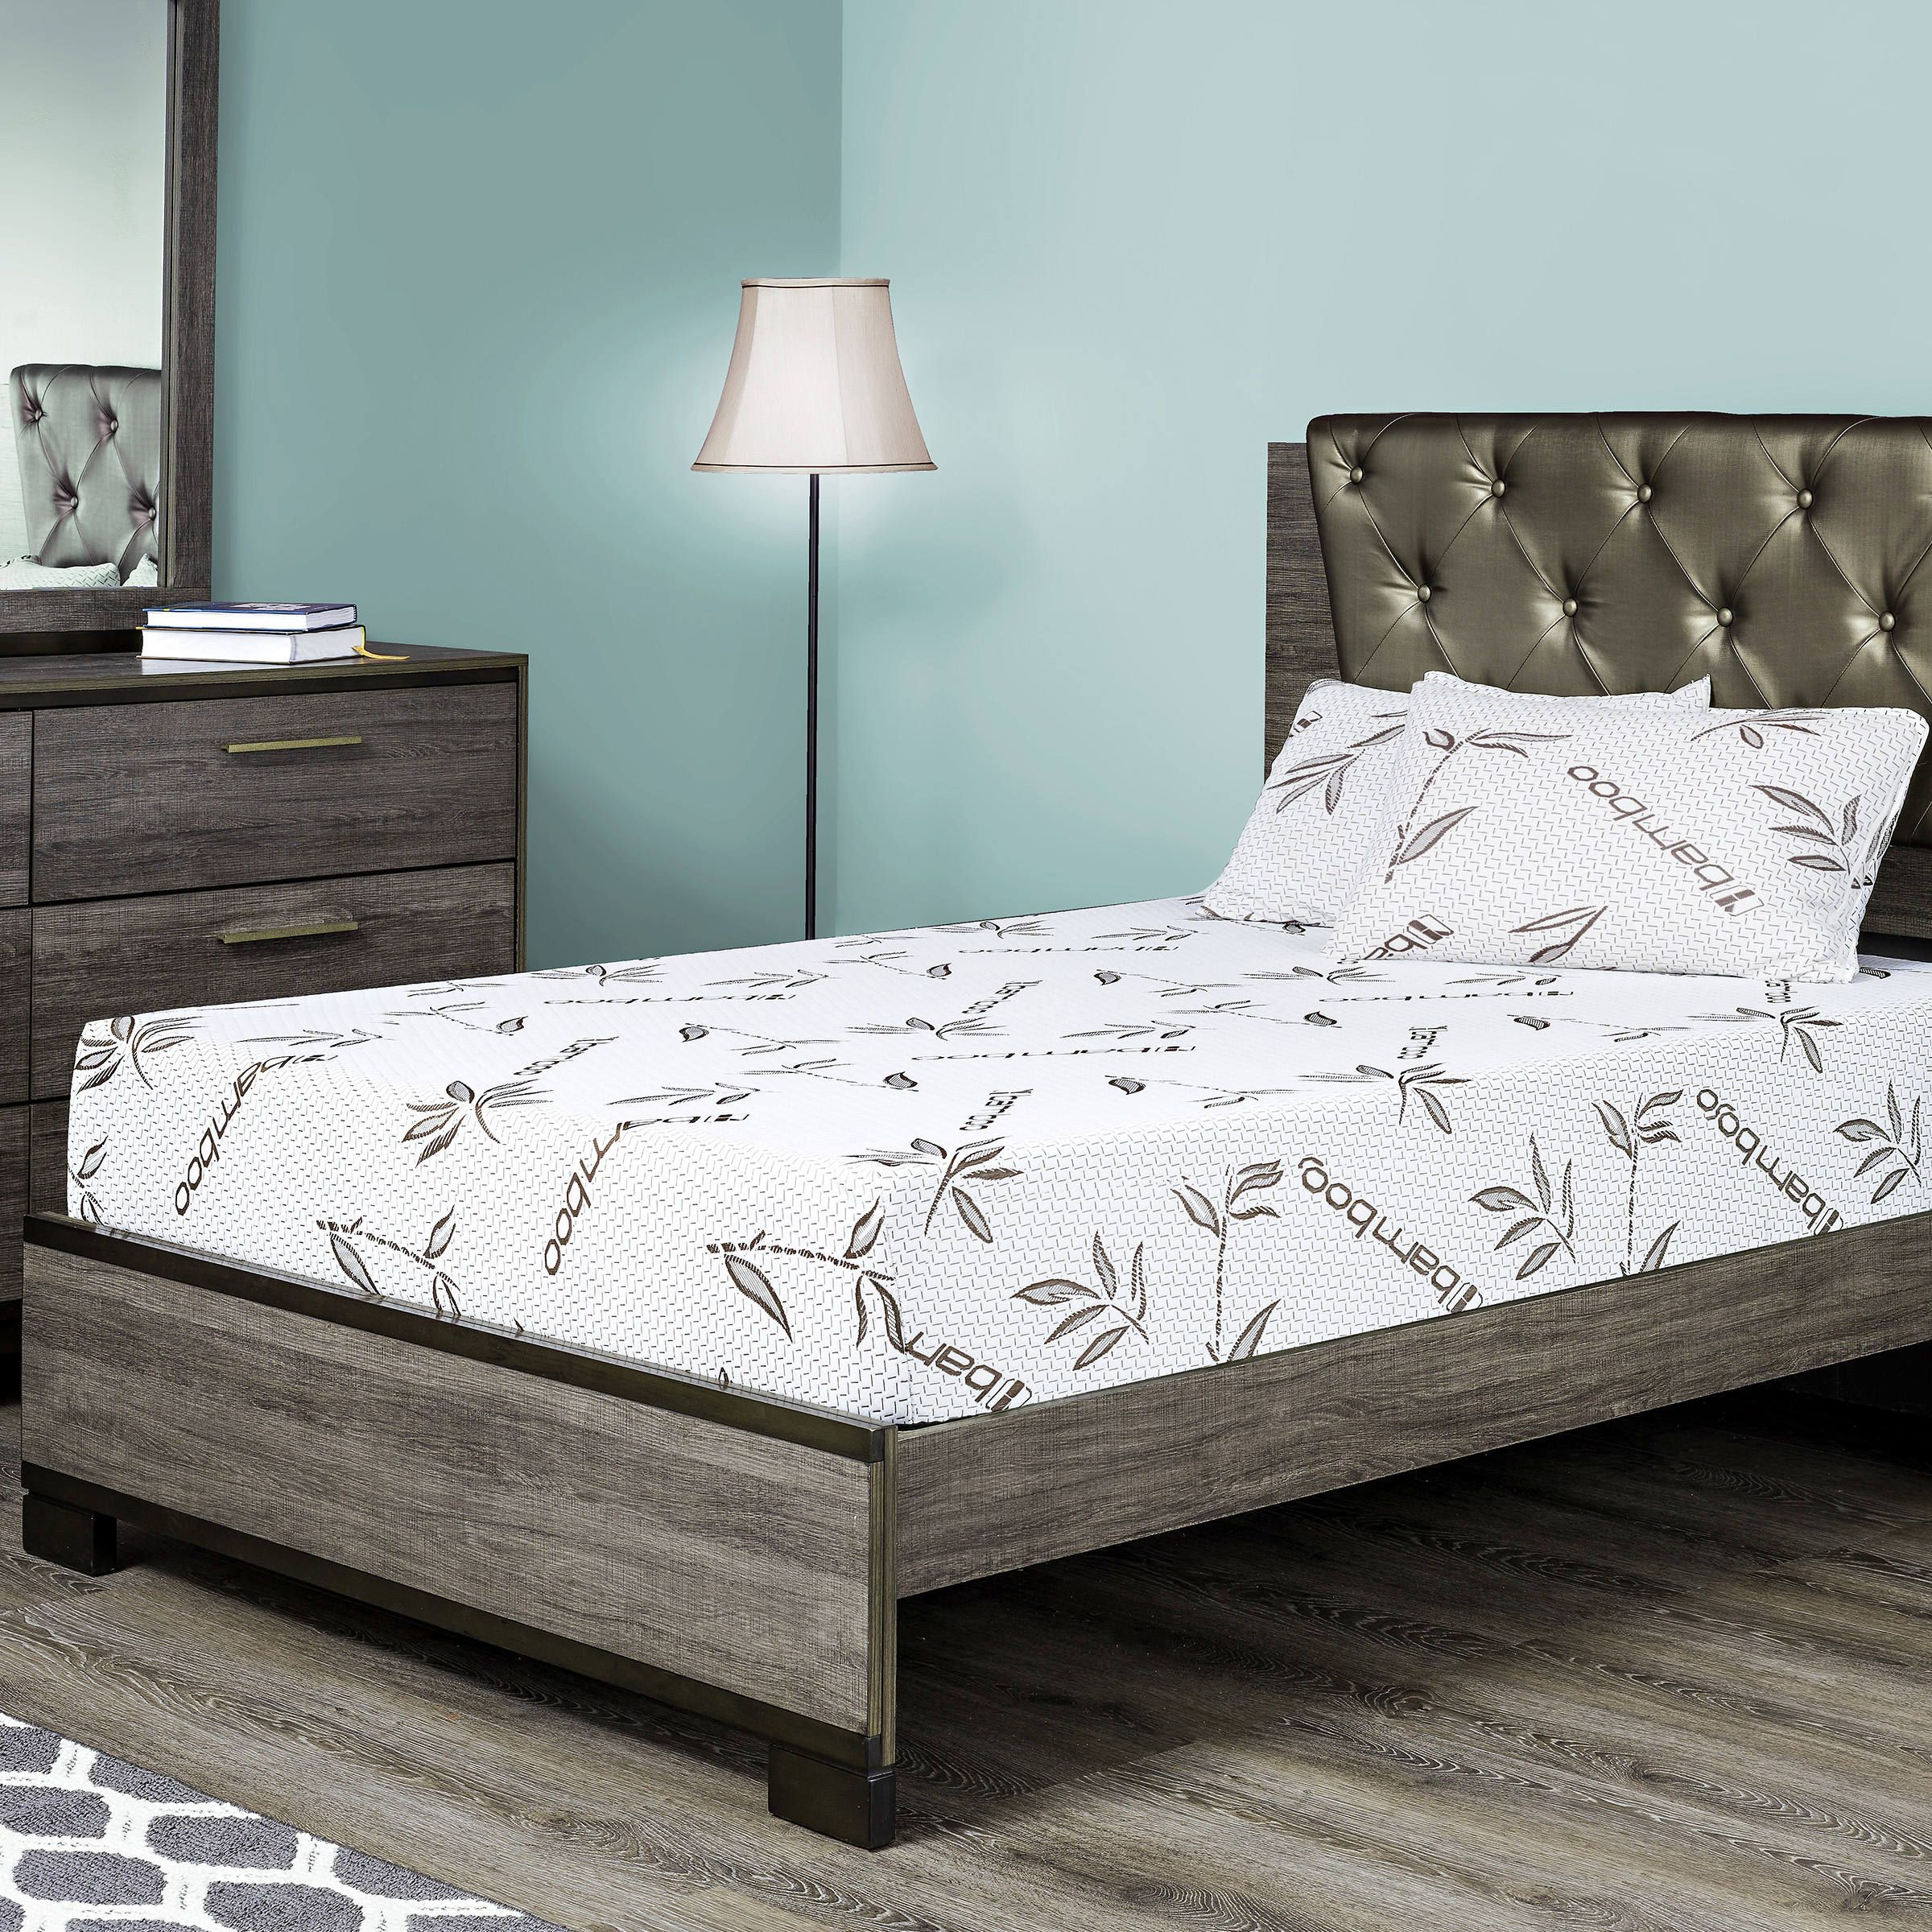 fortnight bedding 8 gel memory foam mattress w bamboo cover cot